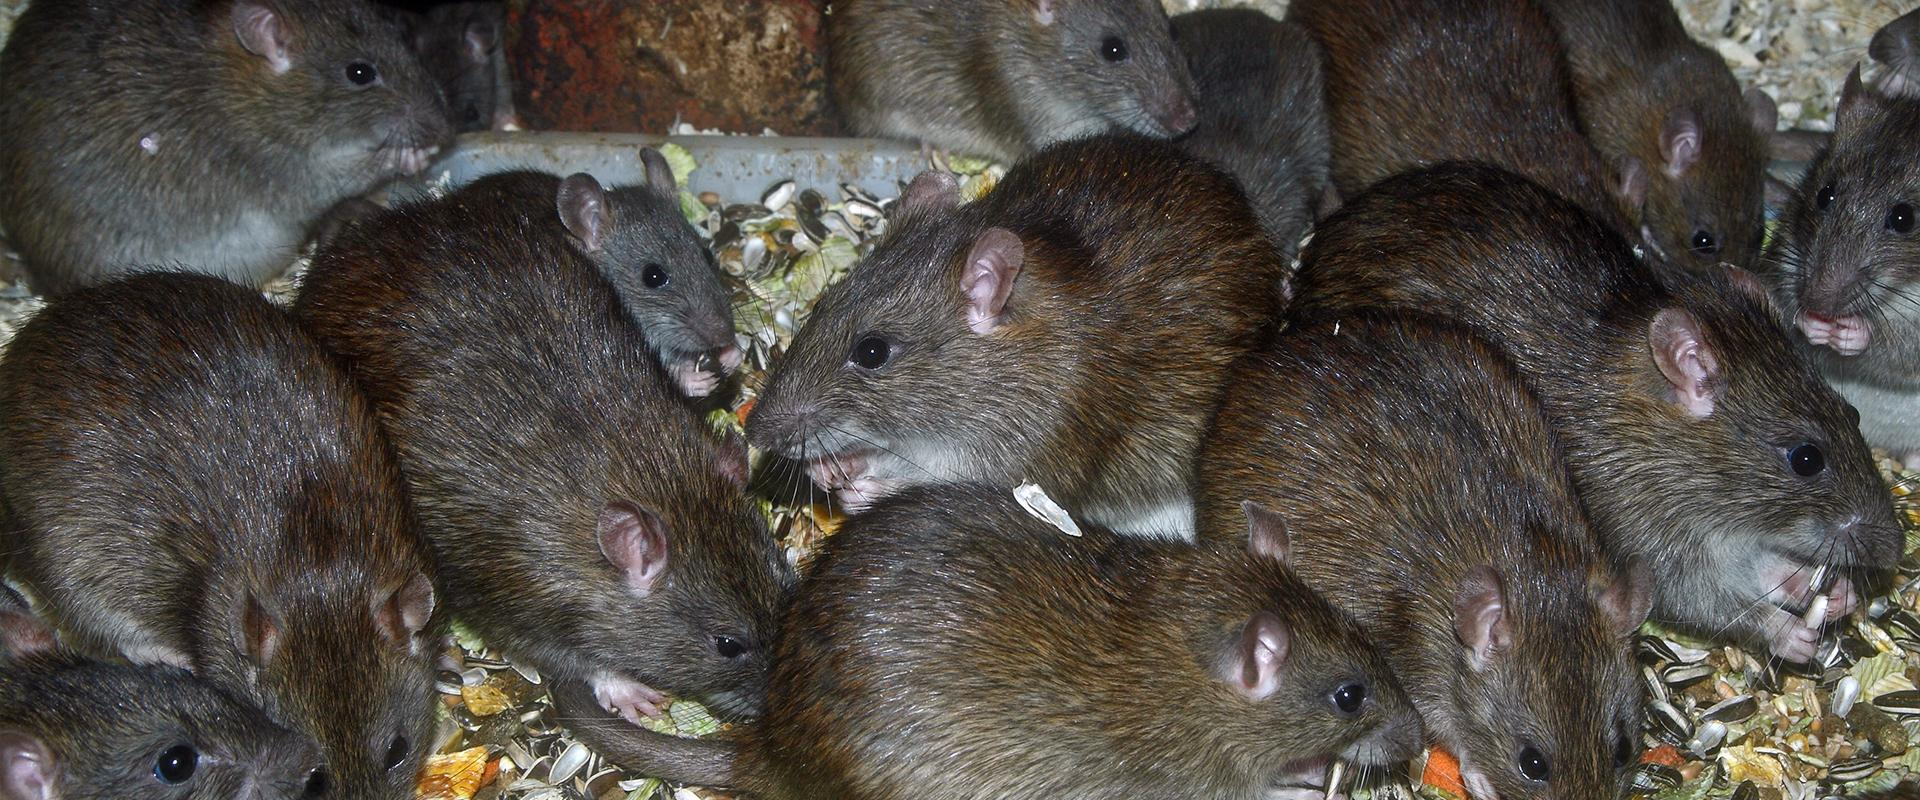 rats gathered in oklahoma city